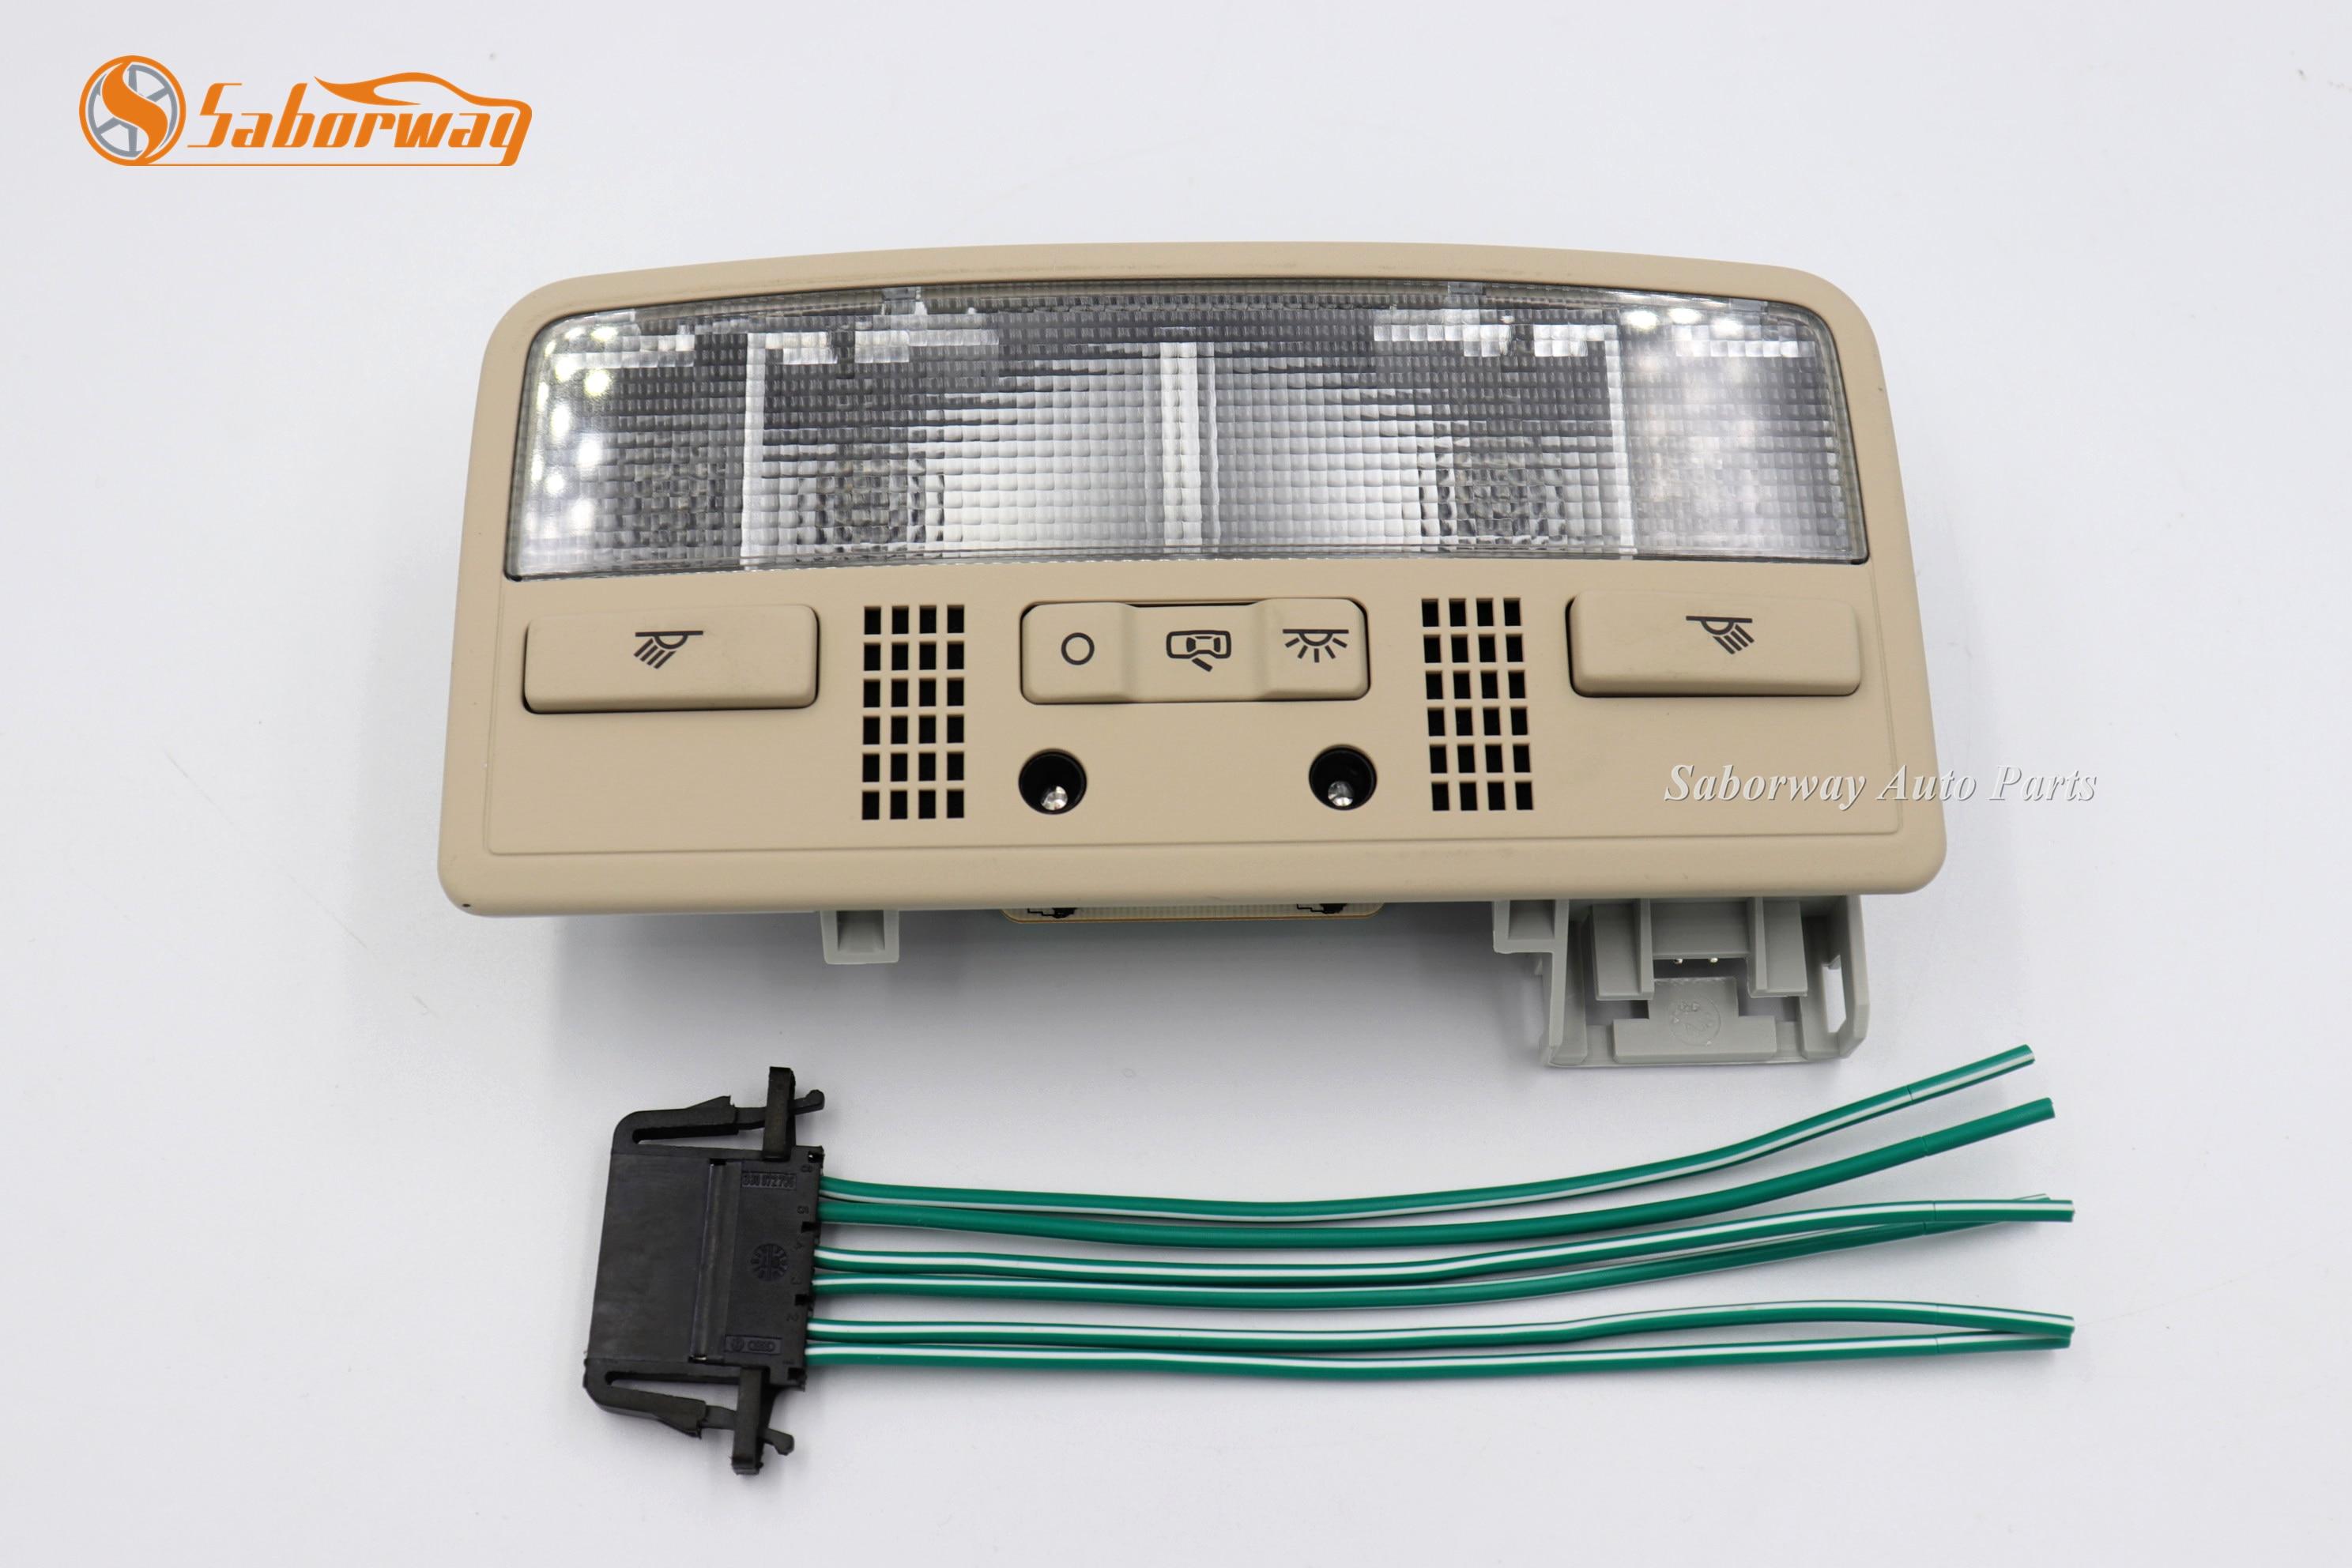 Saborway Beige Interior Dome Light Reading Lamp + Cable For Passat B5 Octavia Superb 3B0 3BD 947 105 2EN 3BD947105